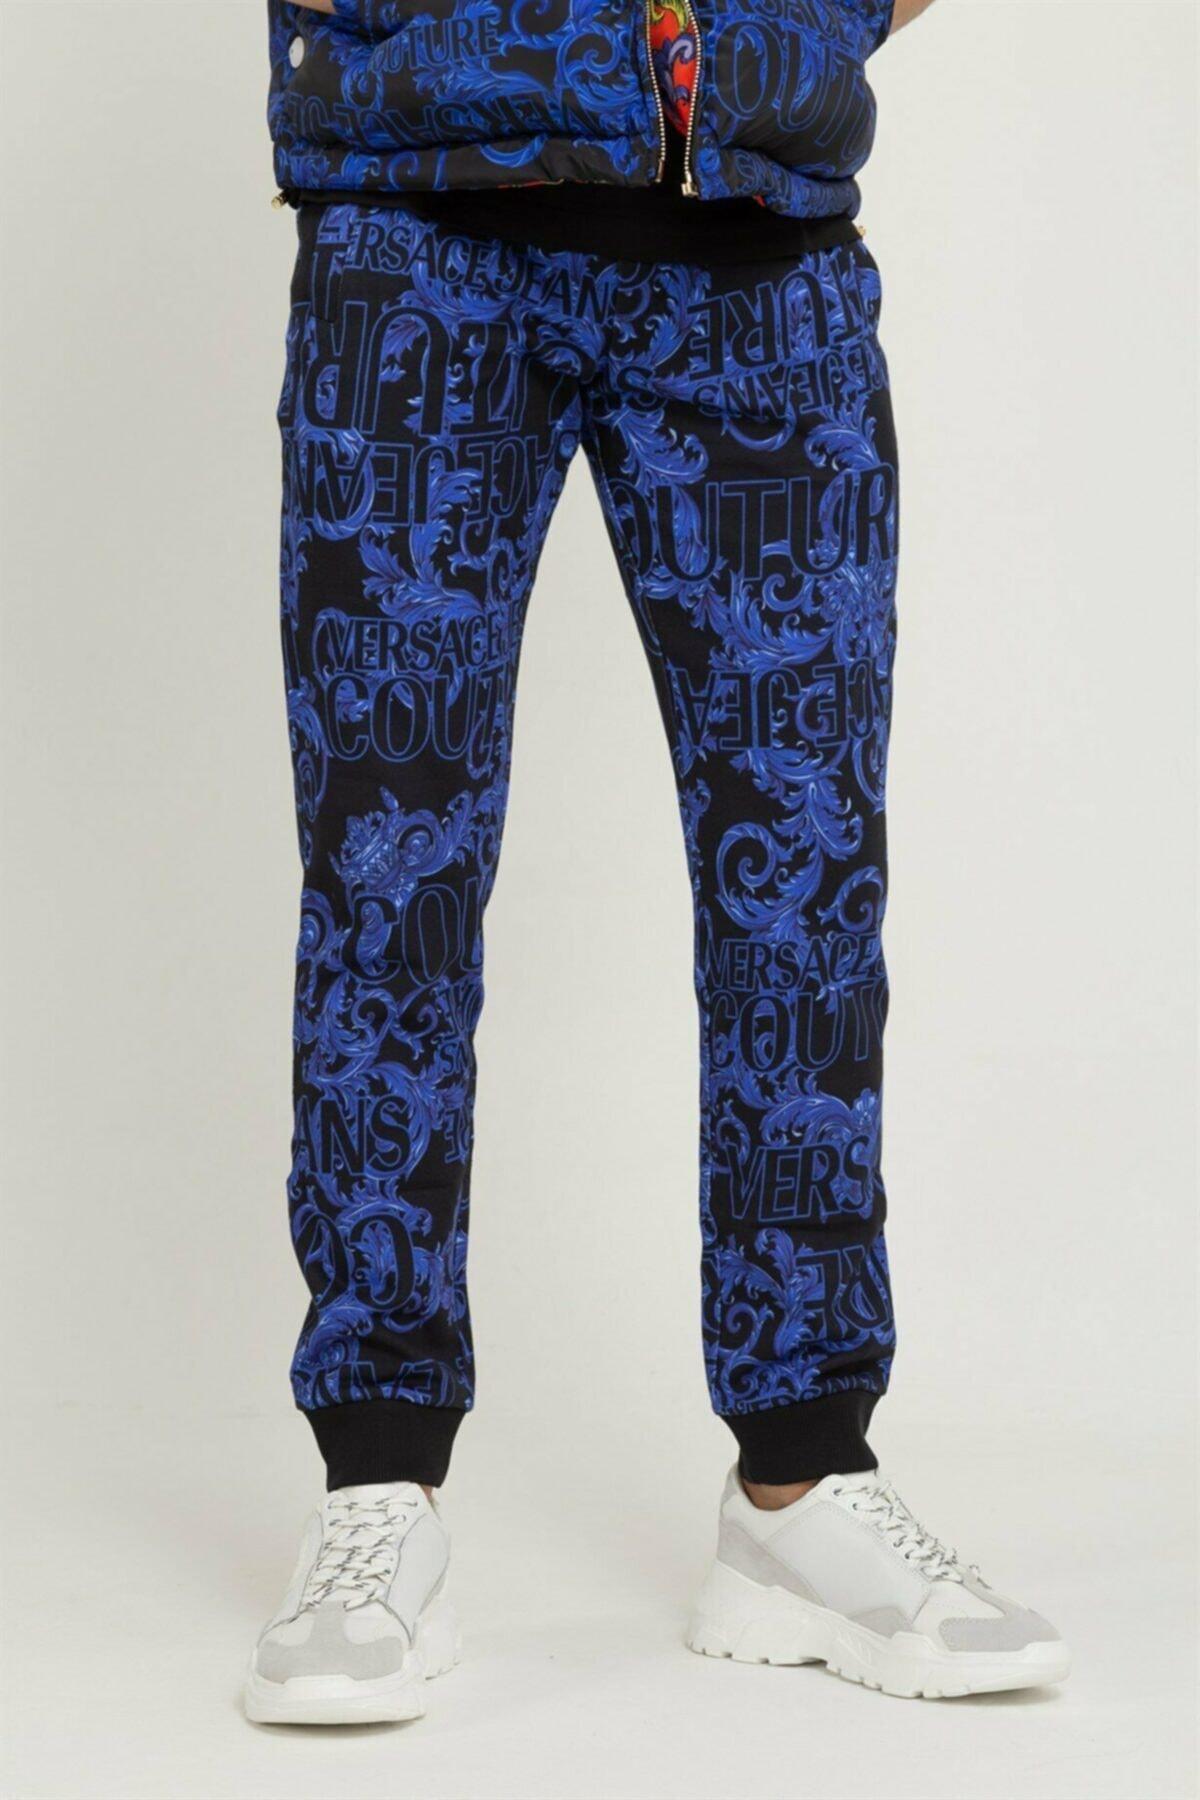 Versace Jeans Couture Baskılı Erkek Pantolon